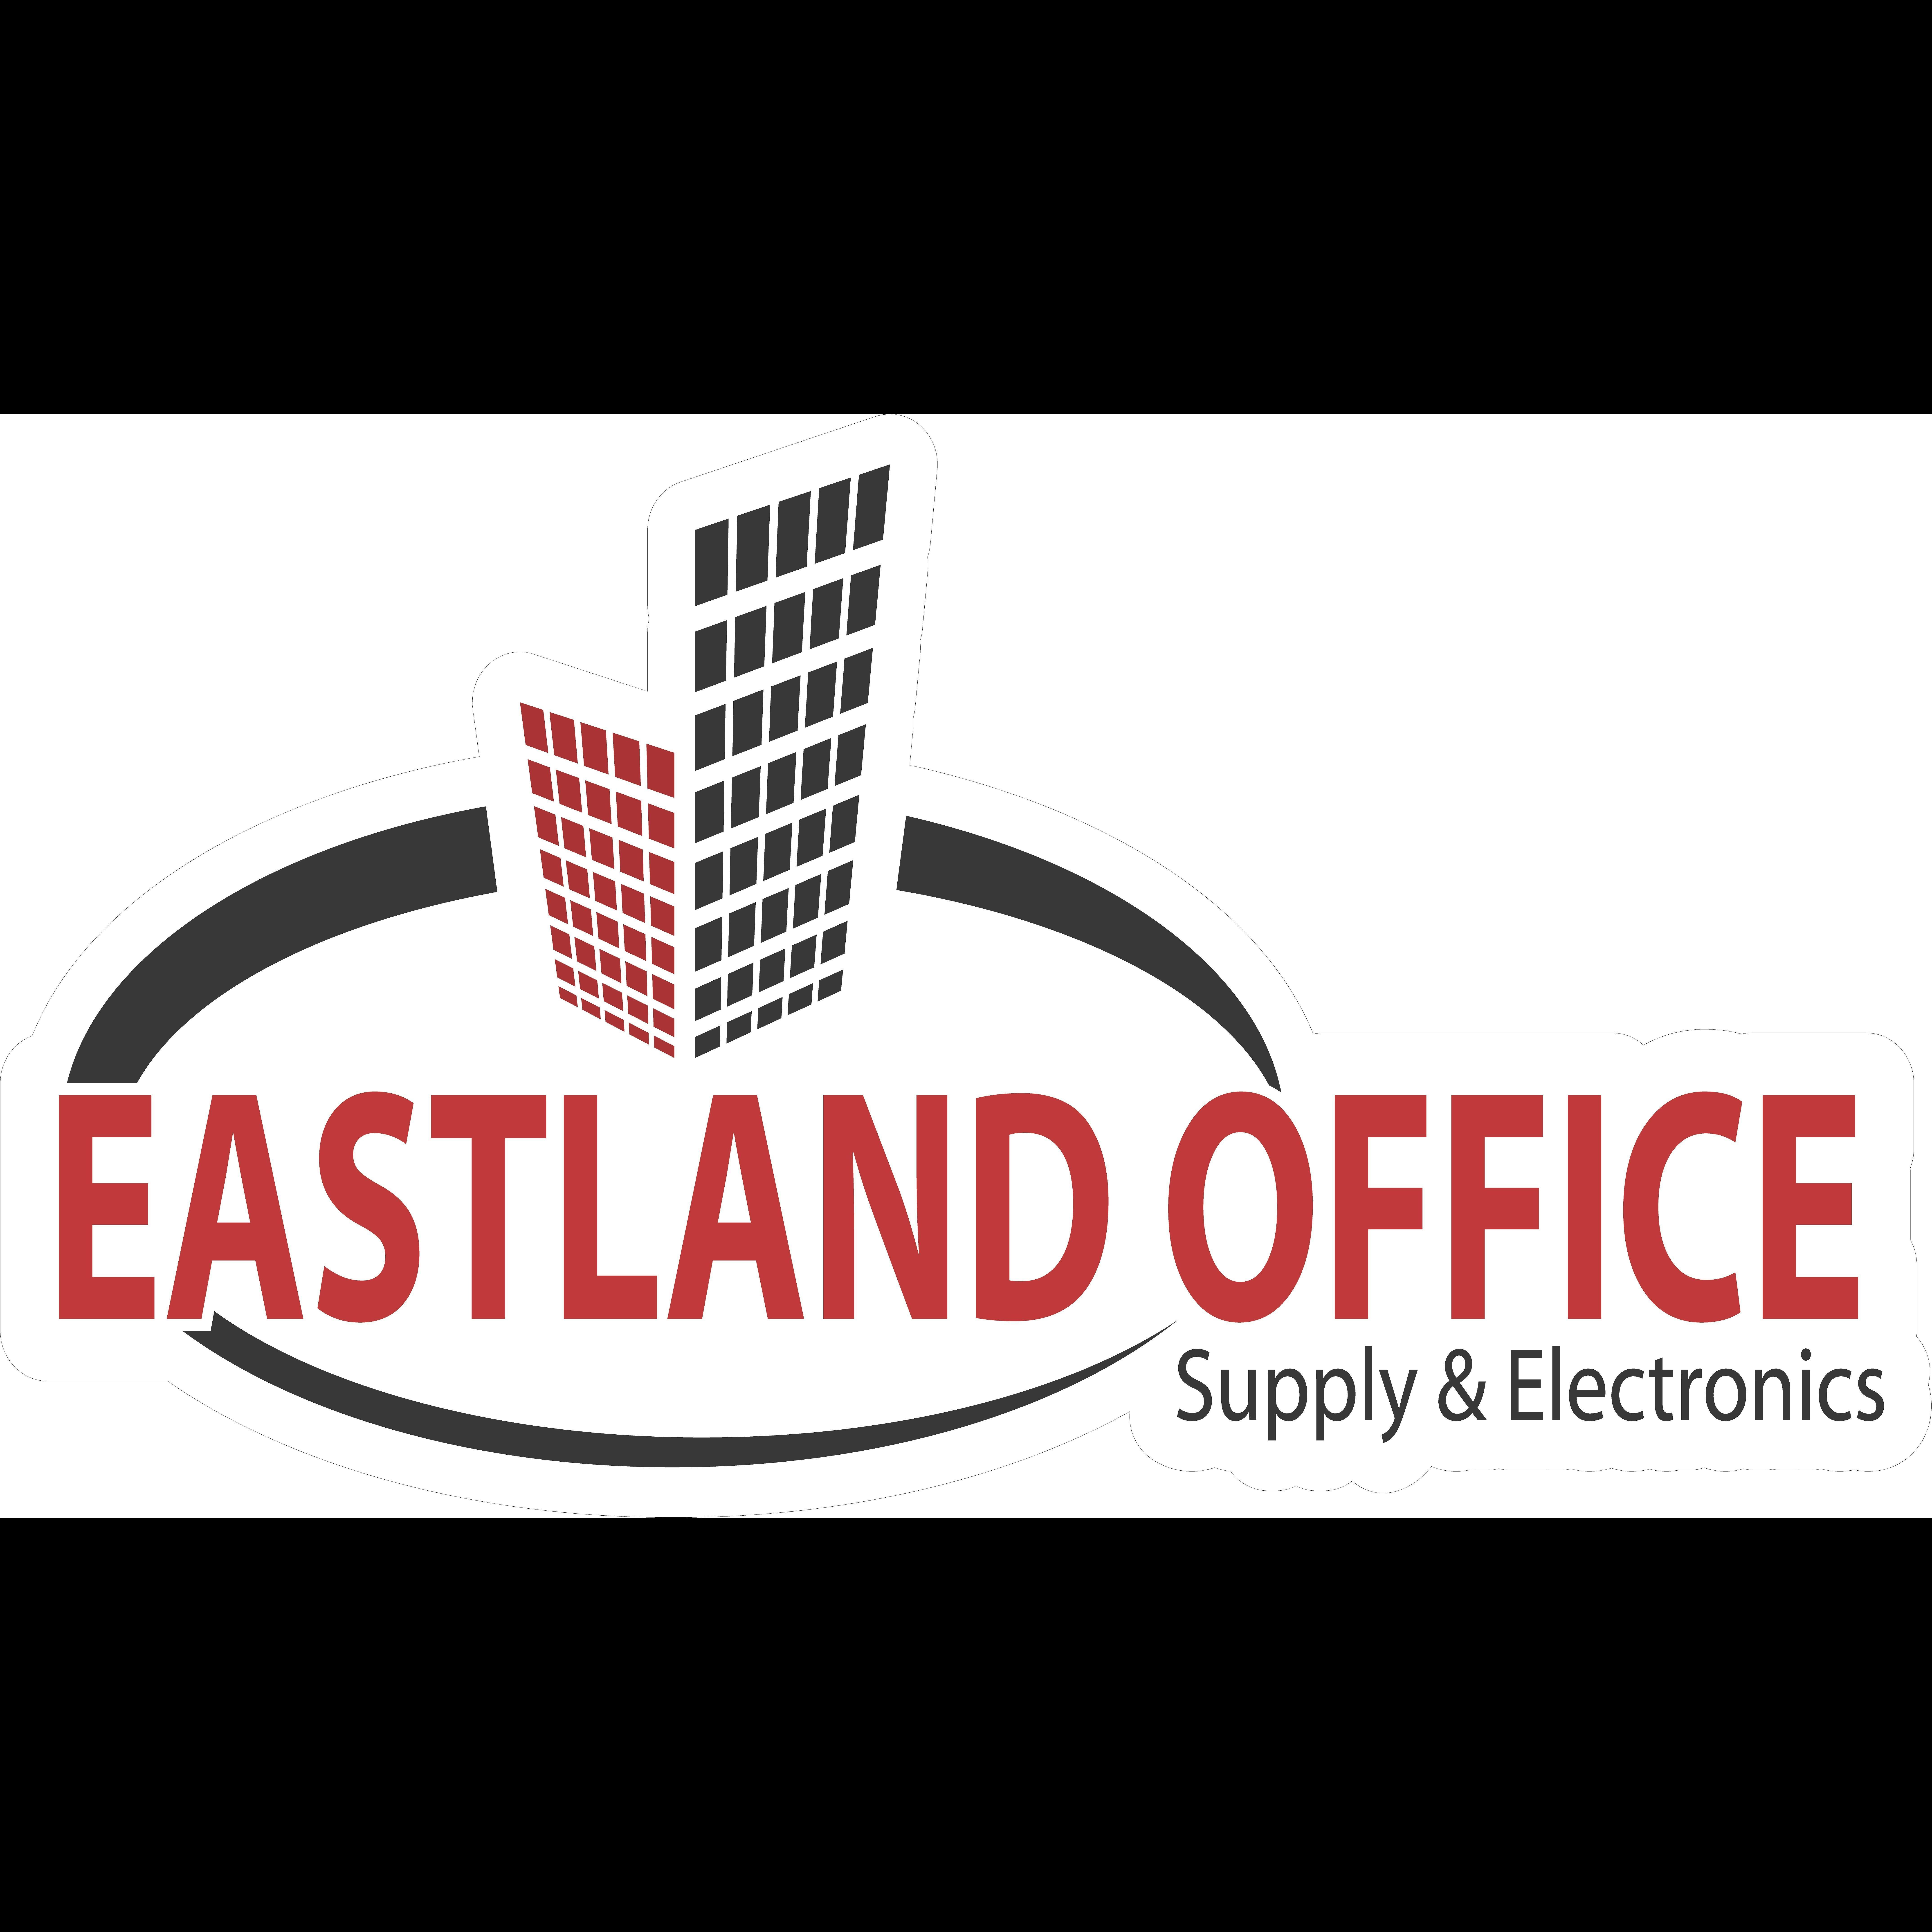 Eastland Office Supply